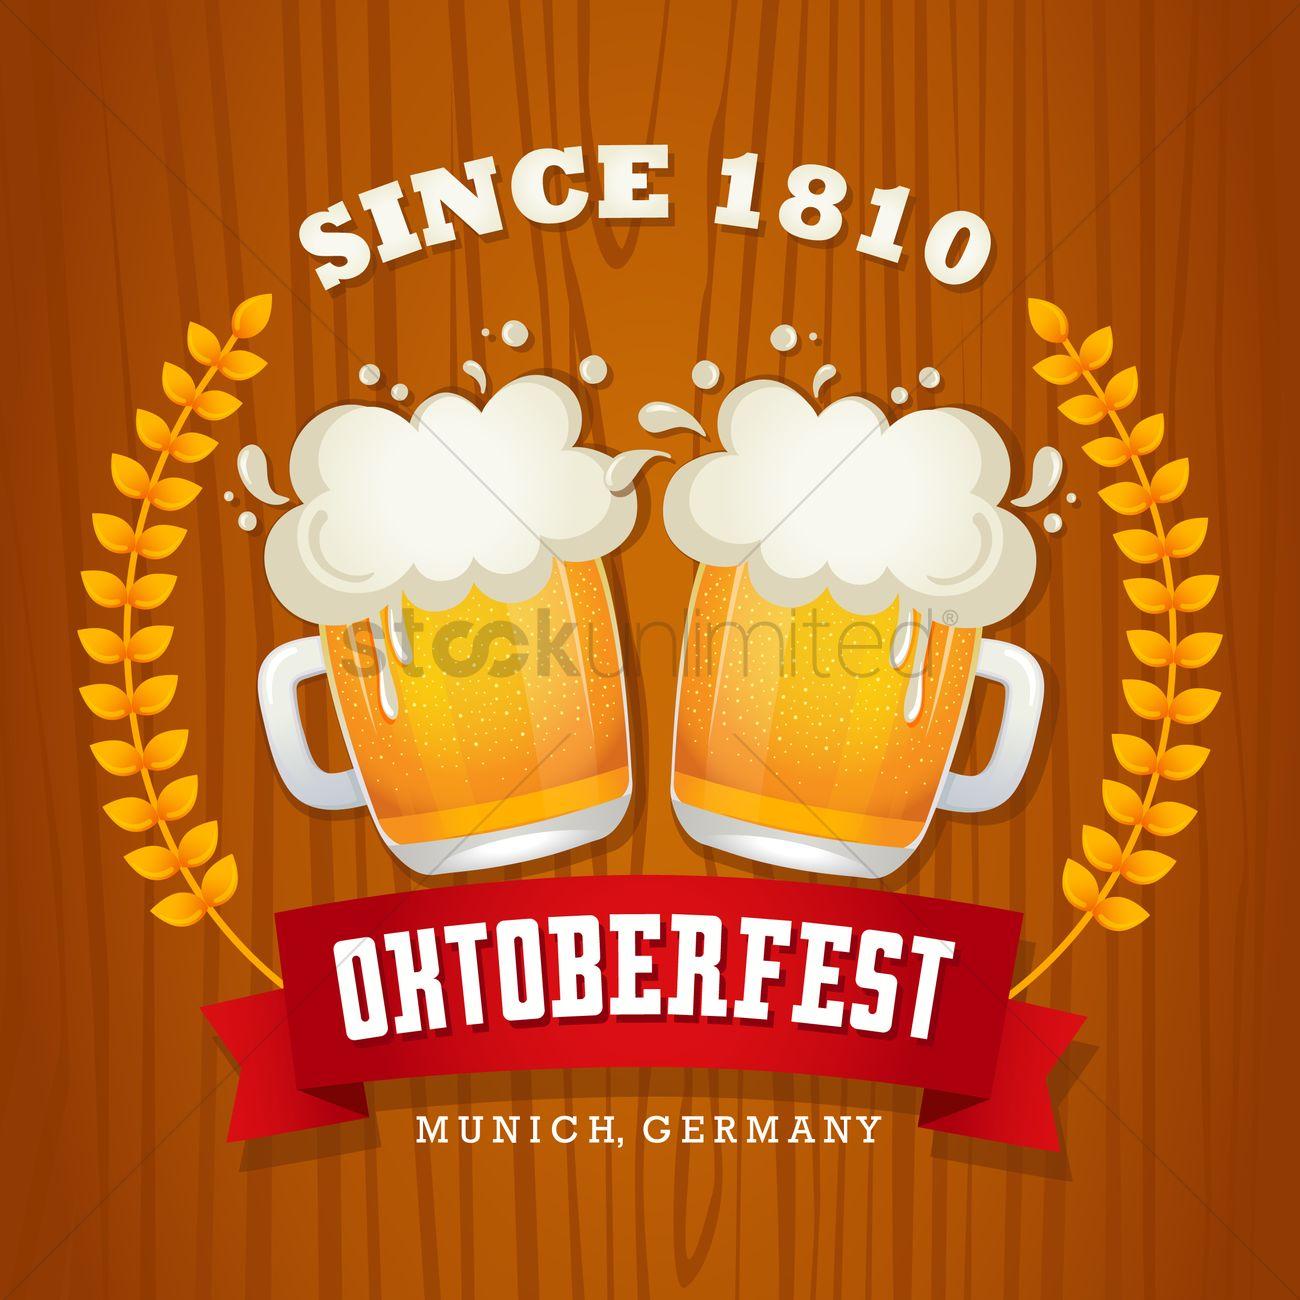 Oktoberfest wallpaper Vector Image - 1480678 | StockUnlimited